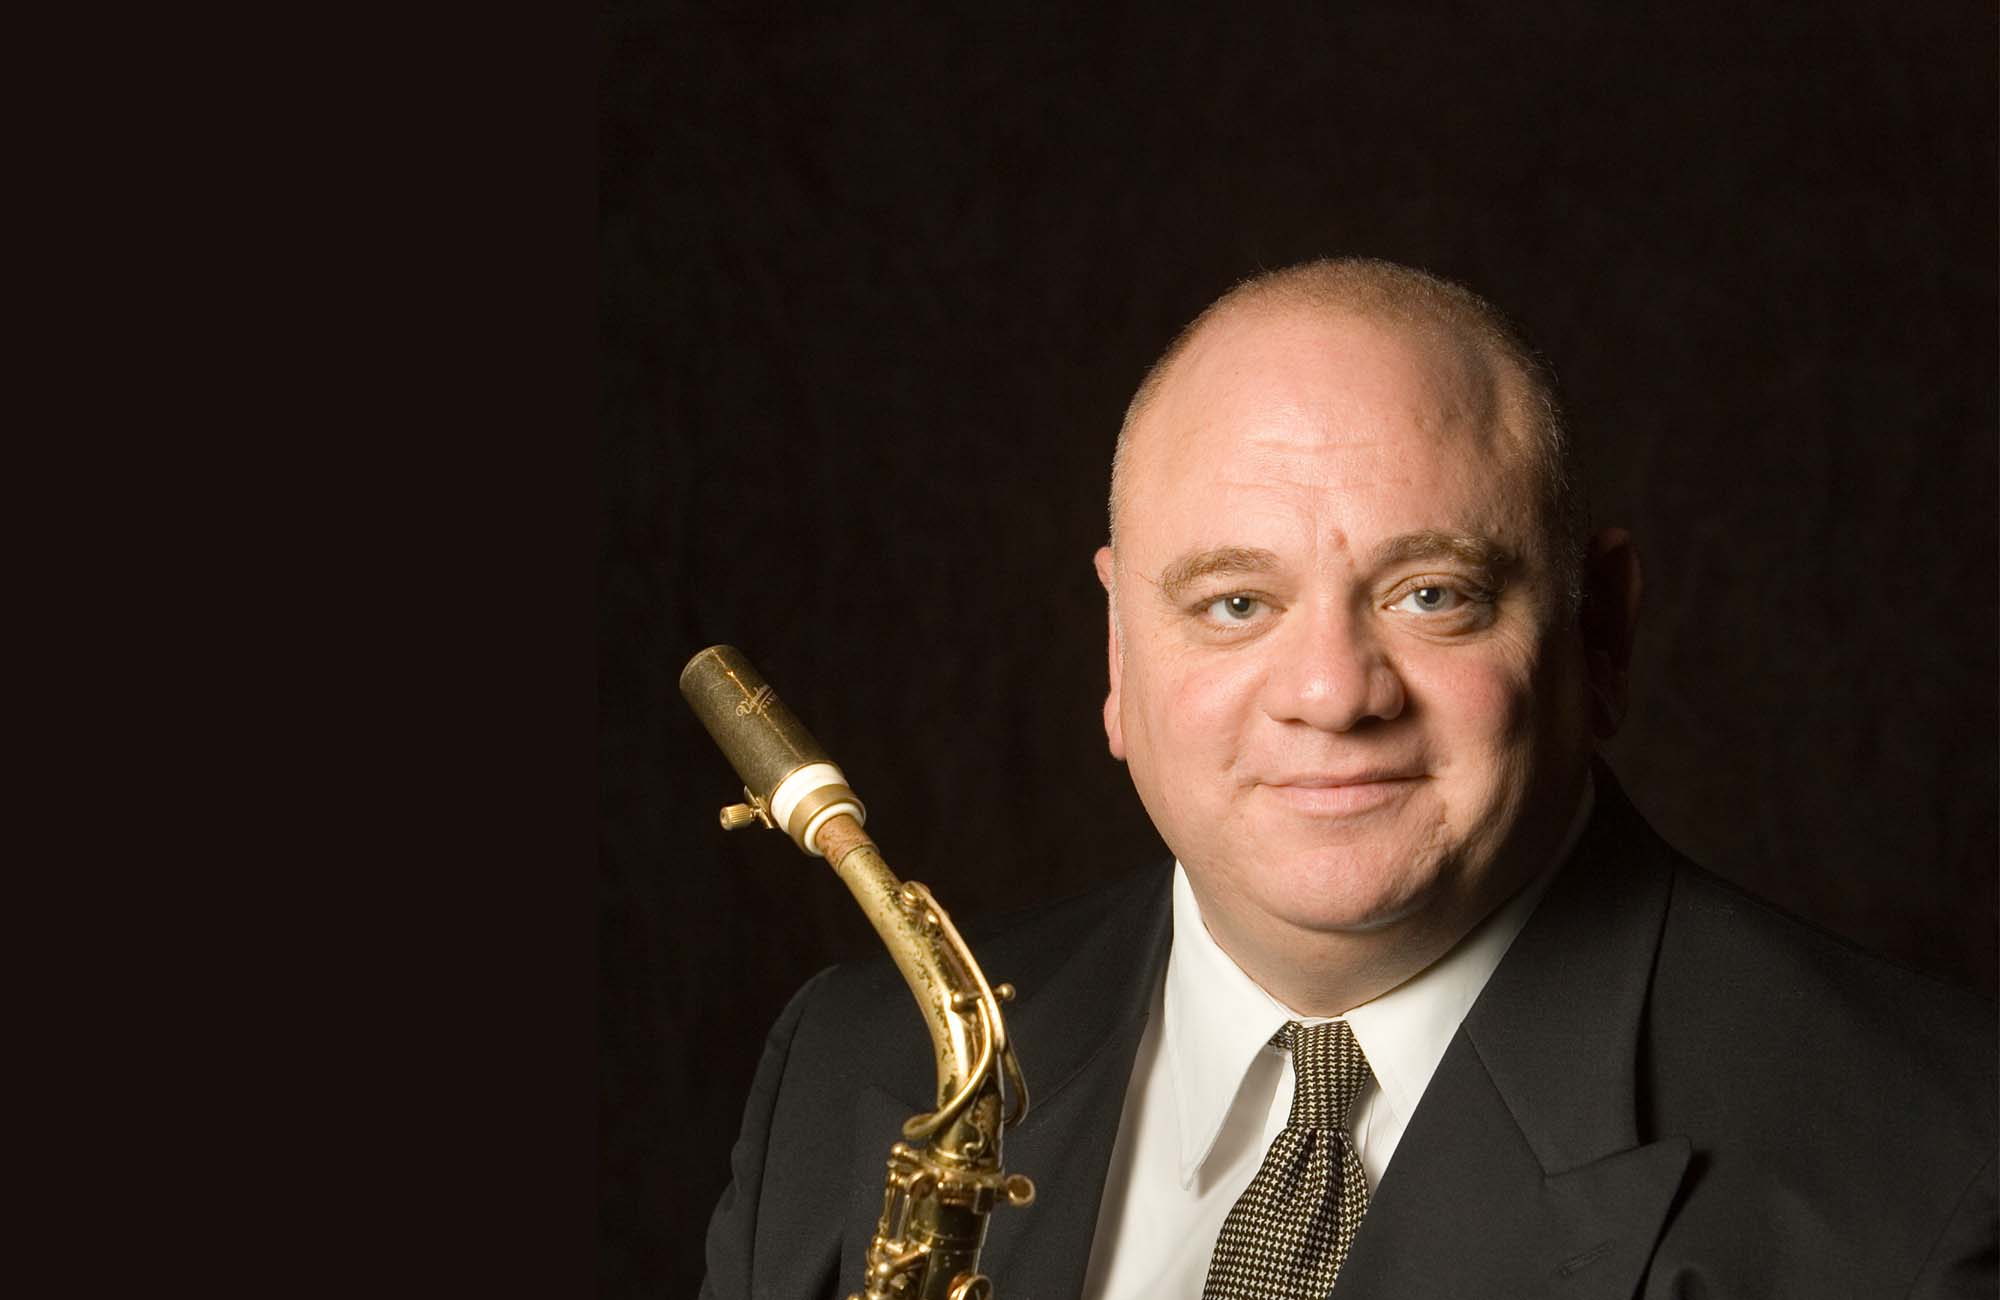 Joe Carello holding Saxophone